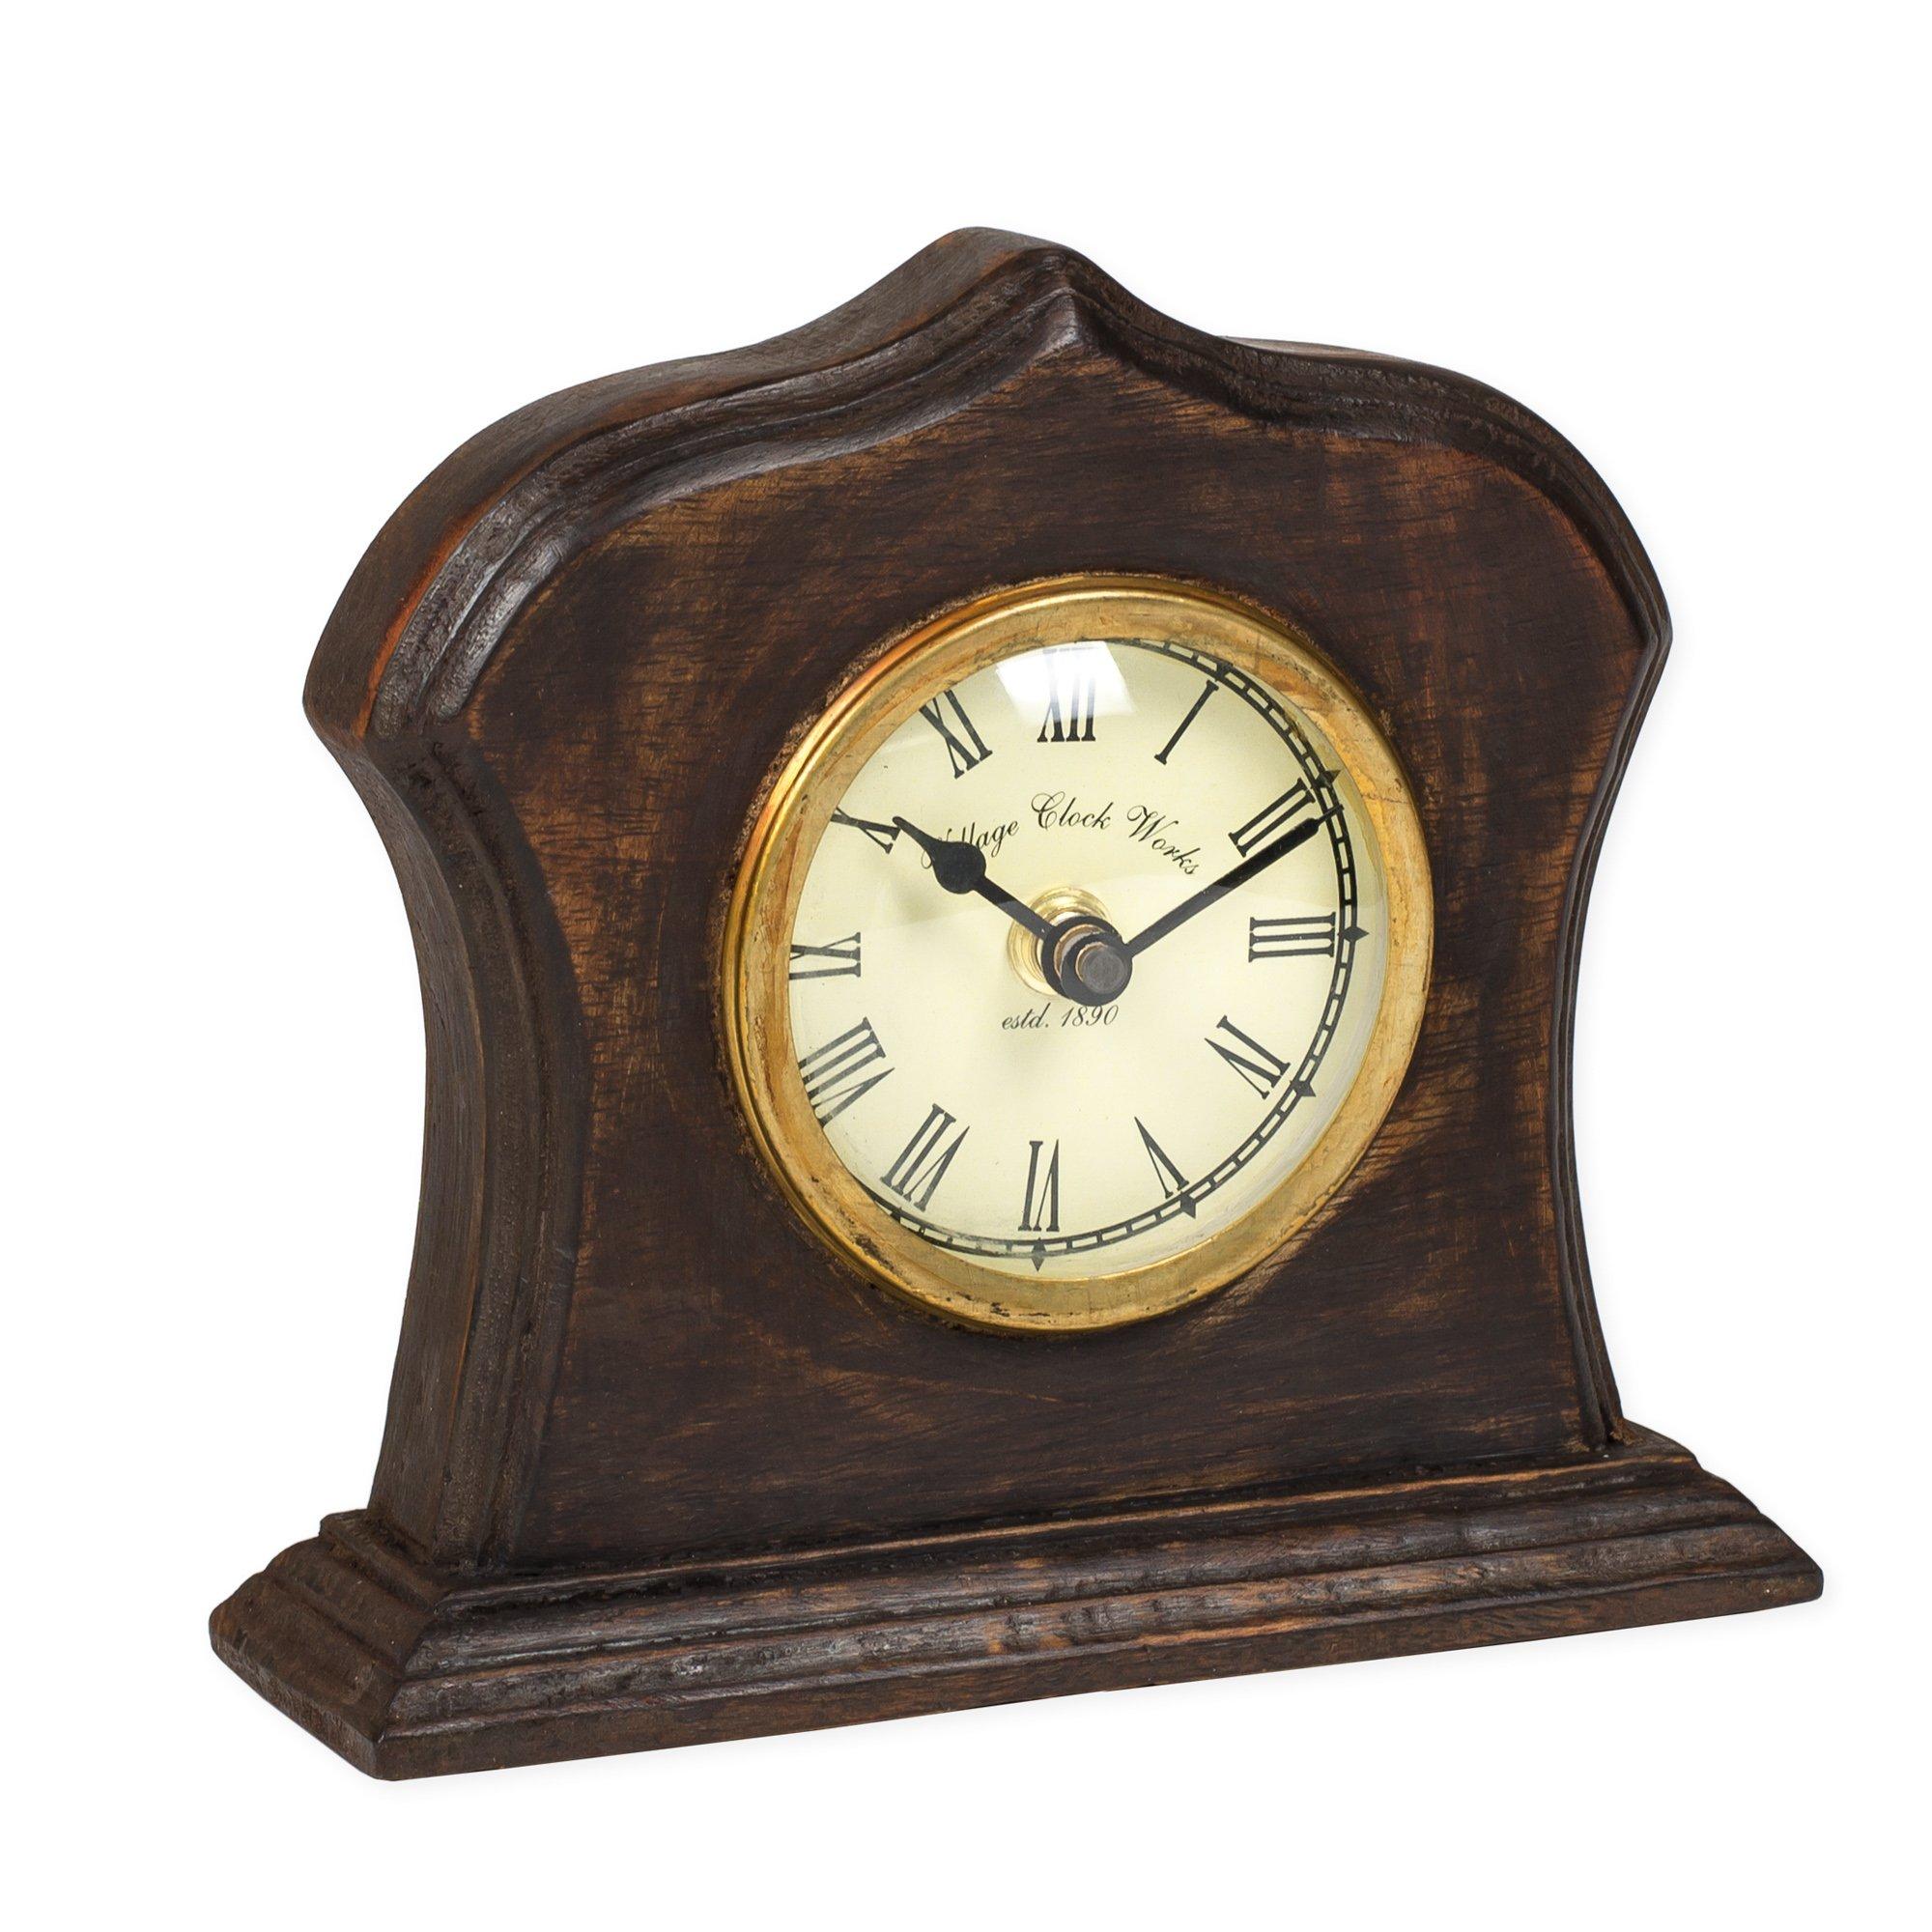 Bristol Village Clockworks Replica 6 x 6 Wooden Table Top Analog Clock